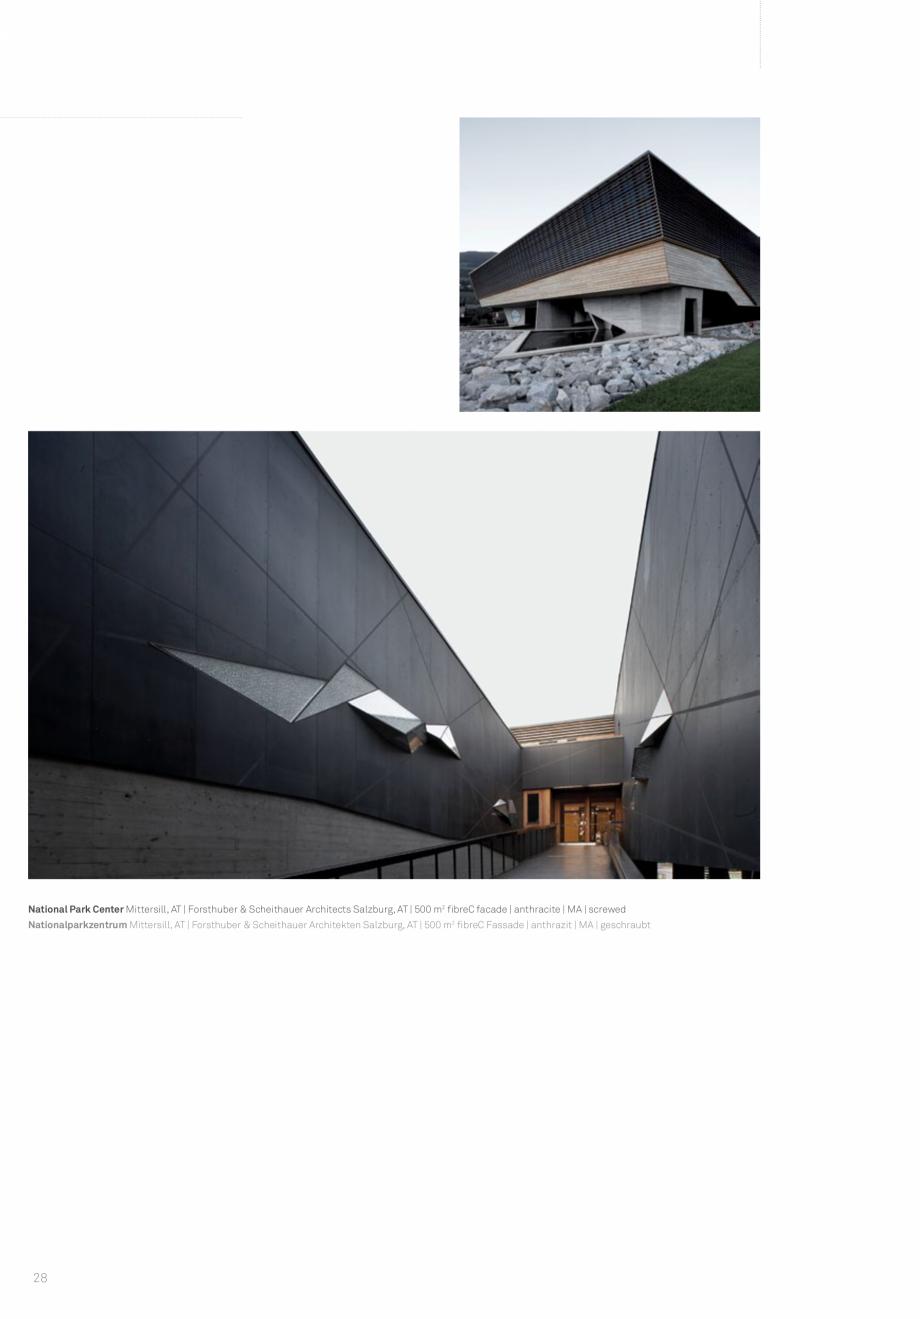 Pagina 30 - Panouri din beton aparent RIEDER Concrete Skin Lucrari, proiecte Engleza ienten, AT |...